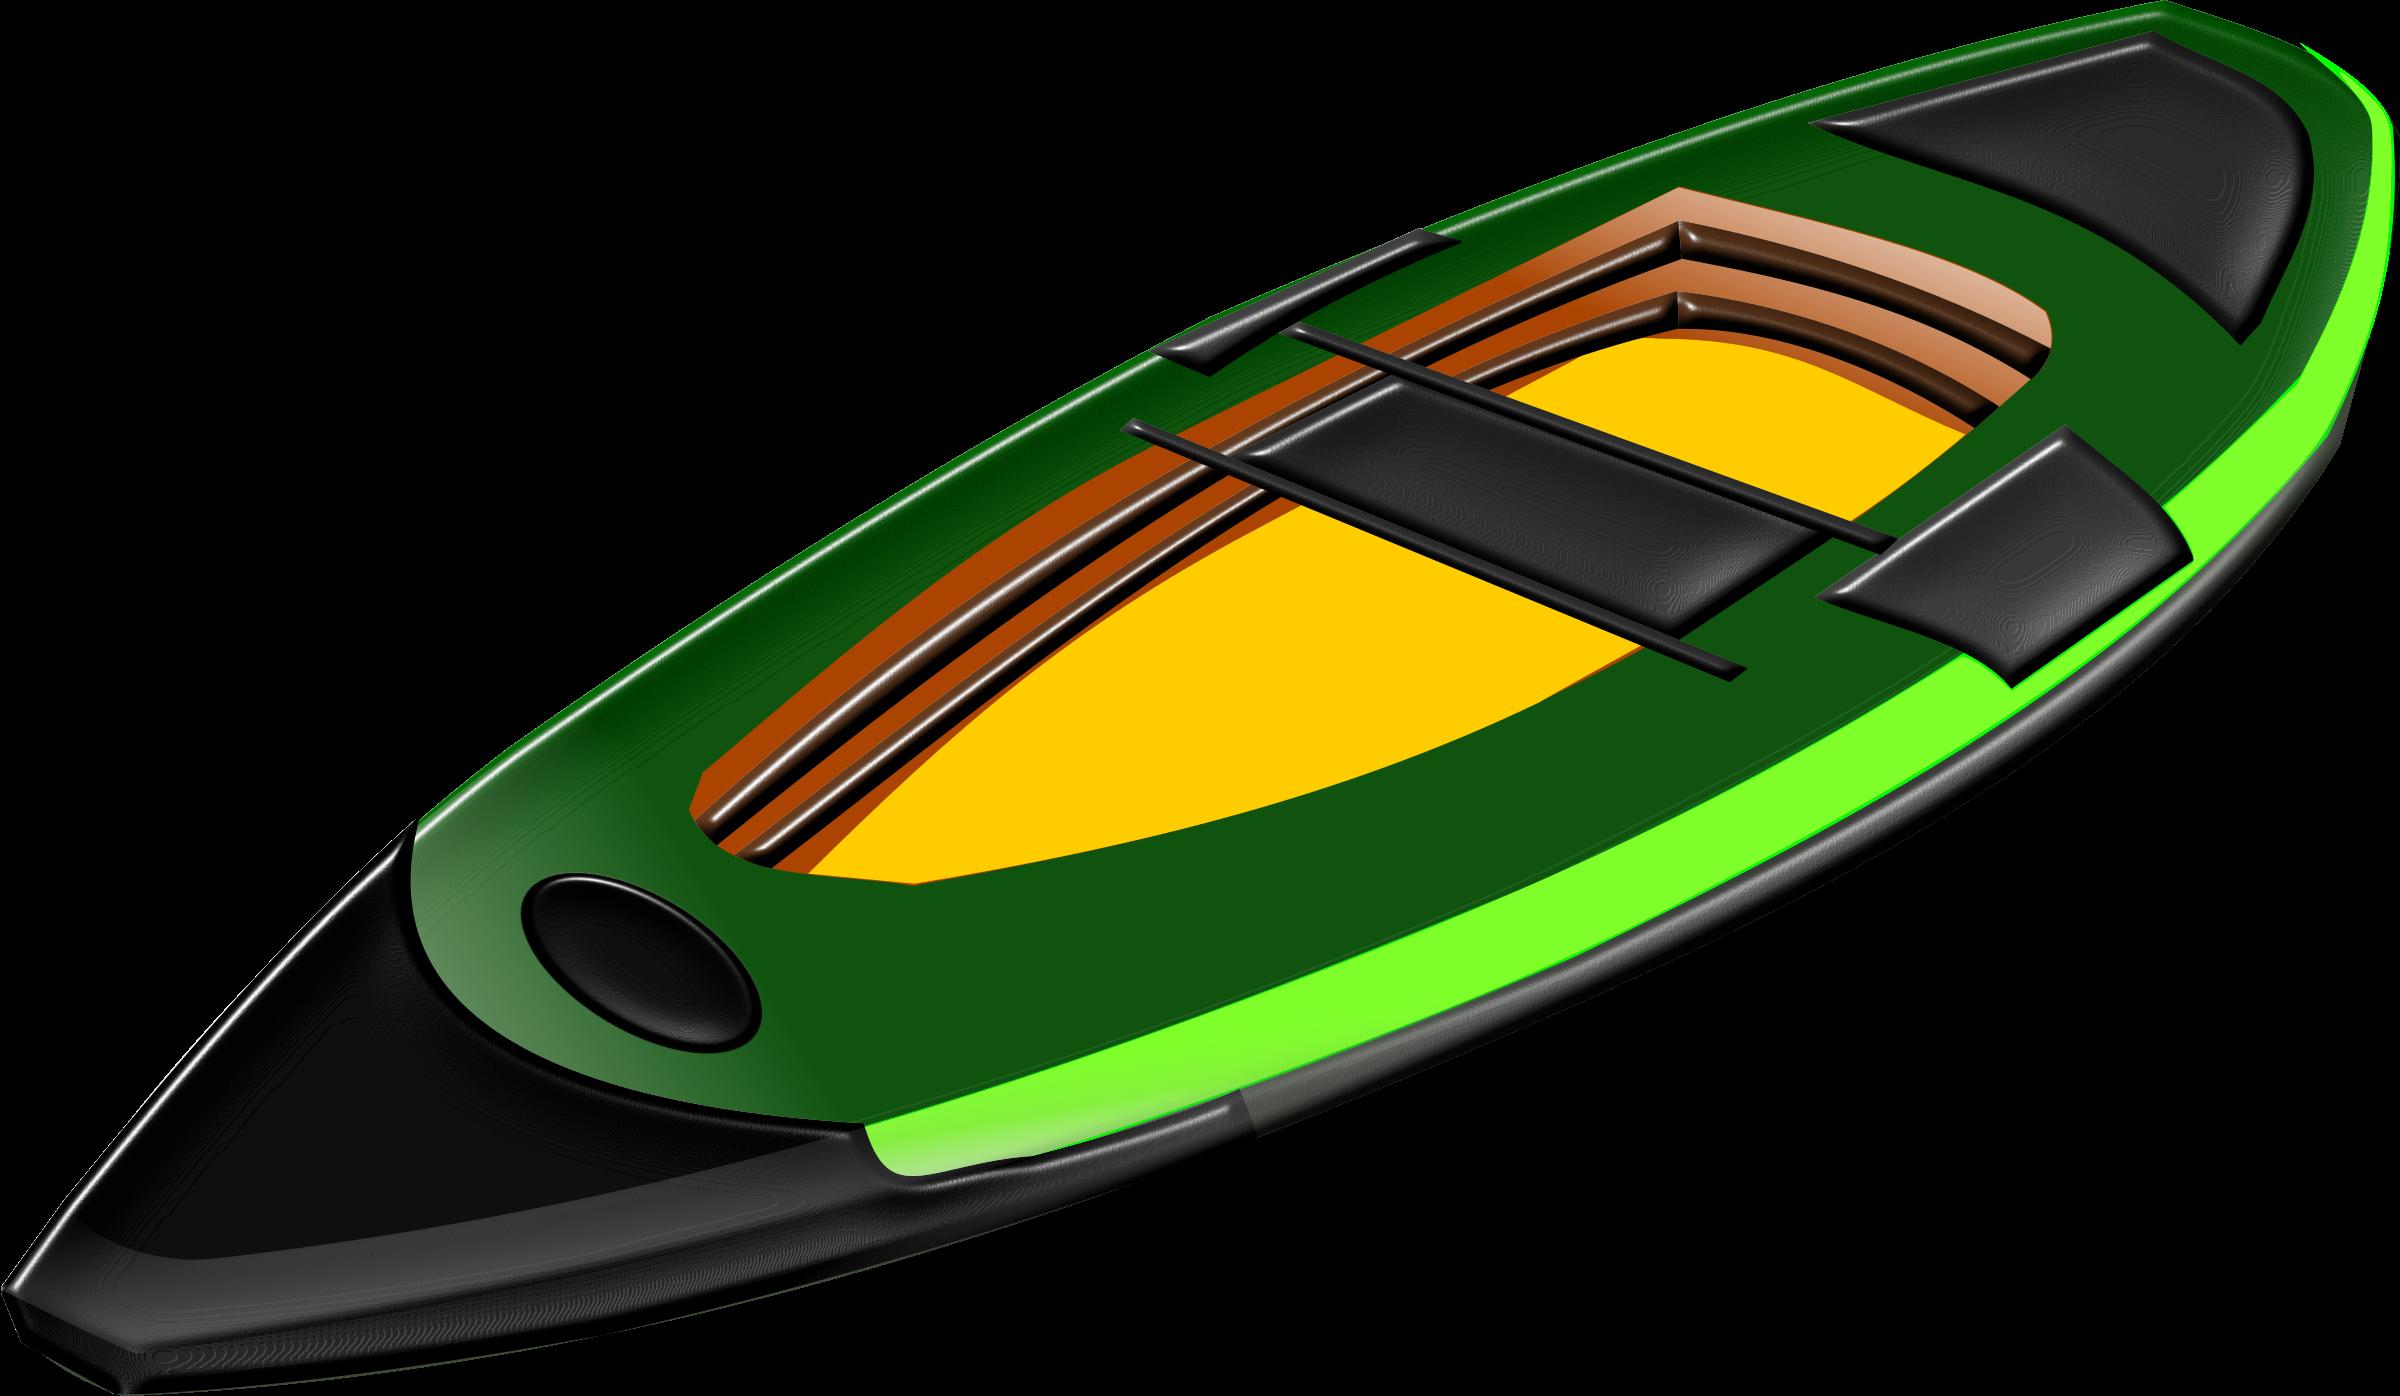 kayak clipart clipart suggest